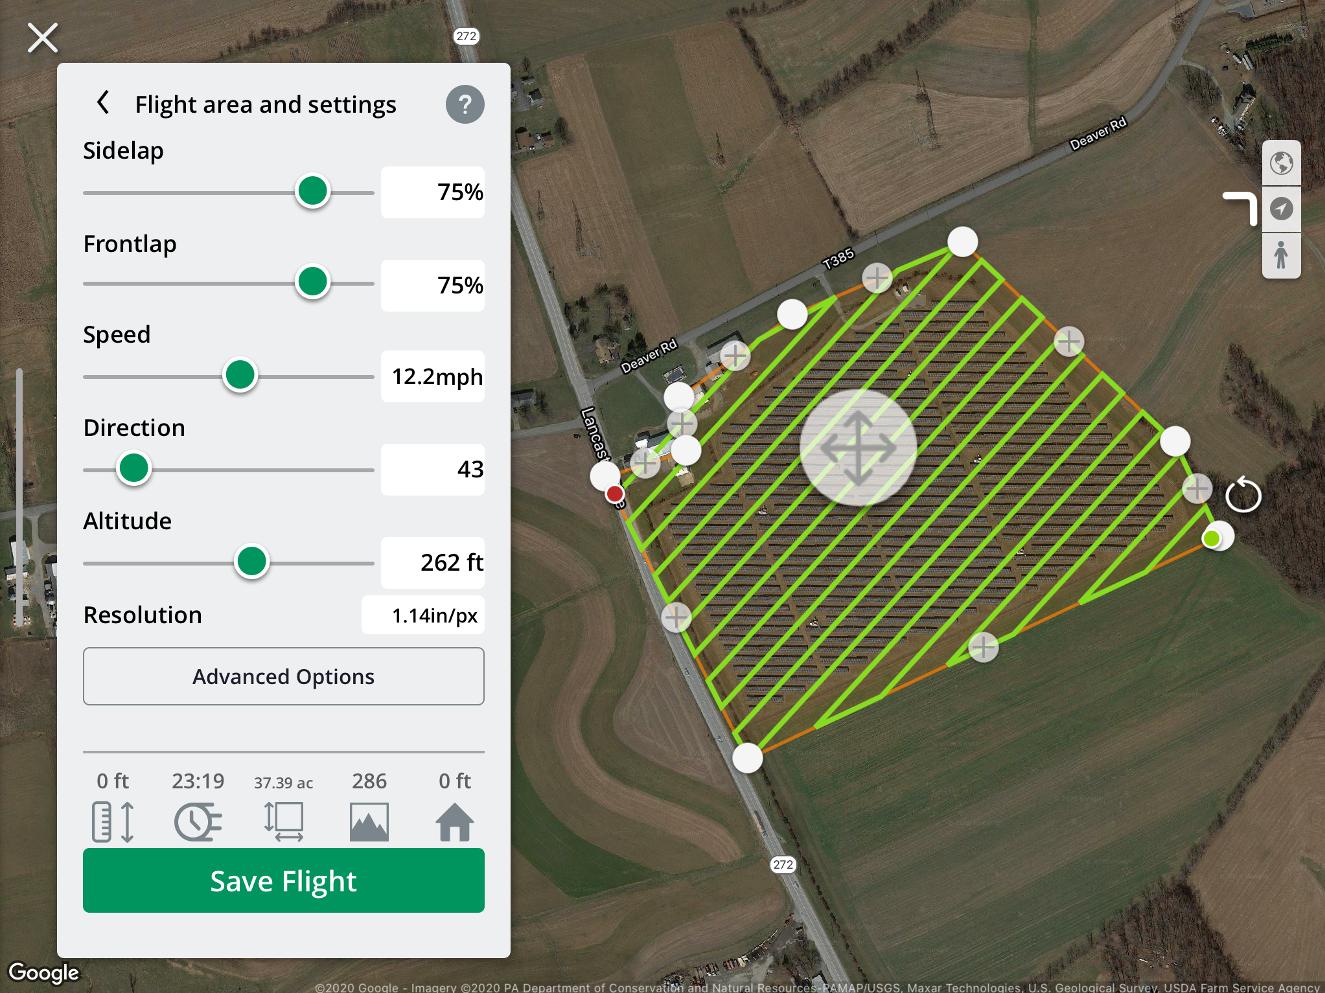 Grid flight screen in the MGC flight app